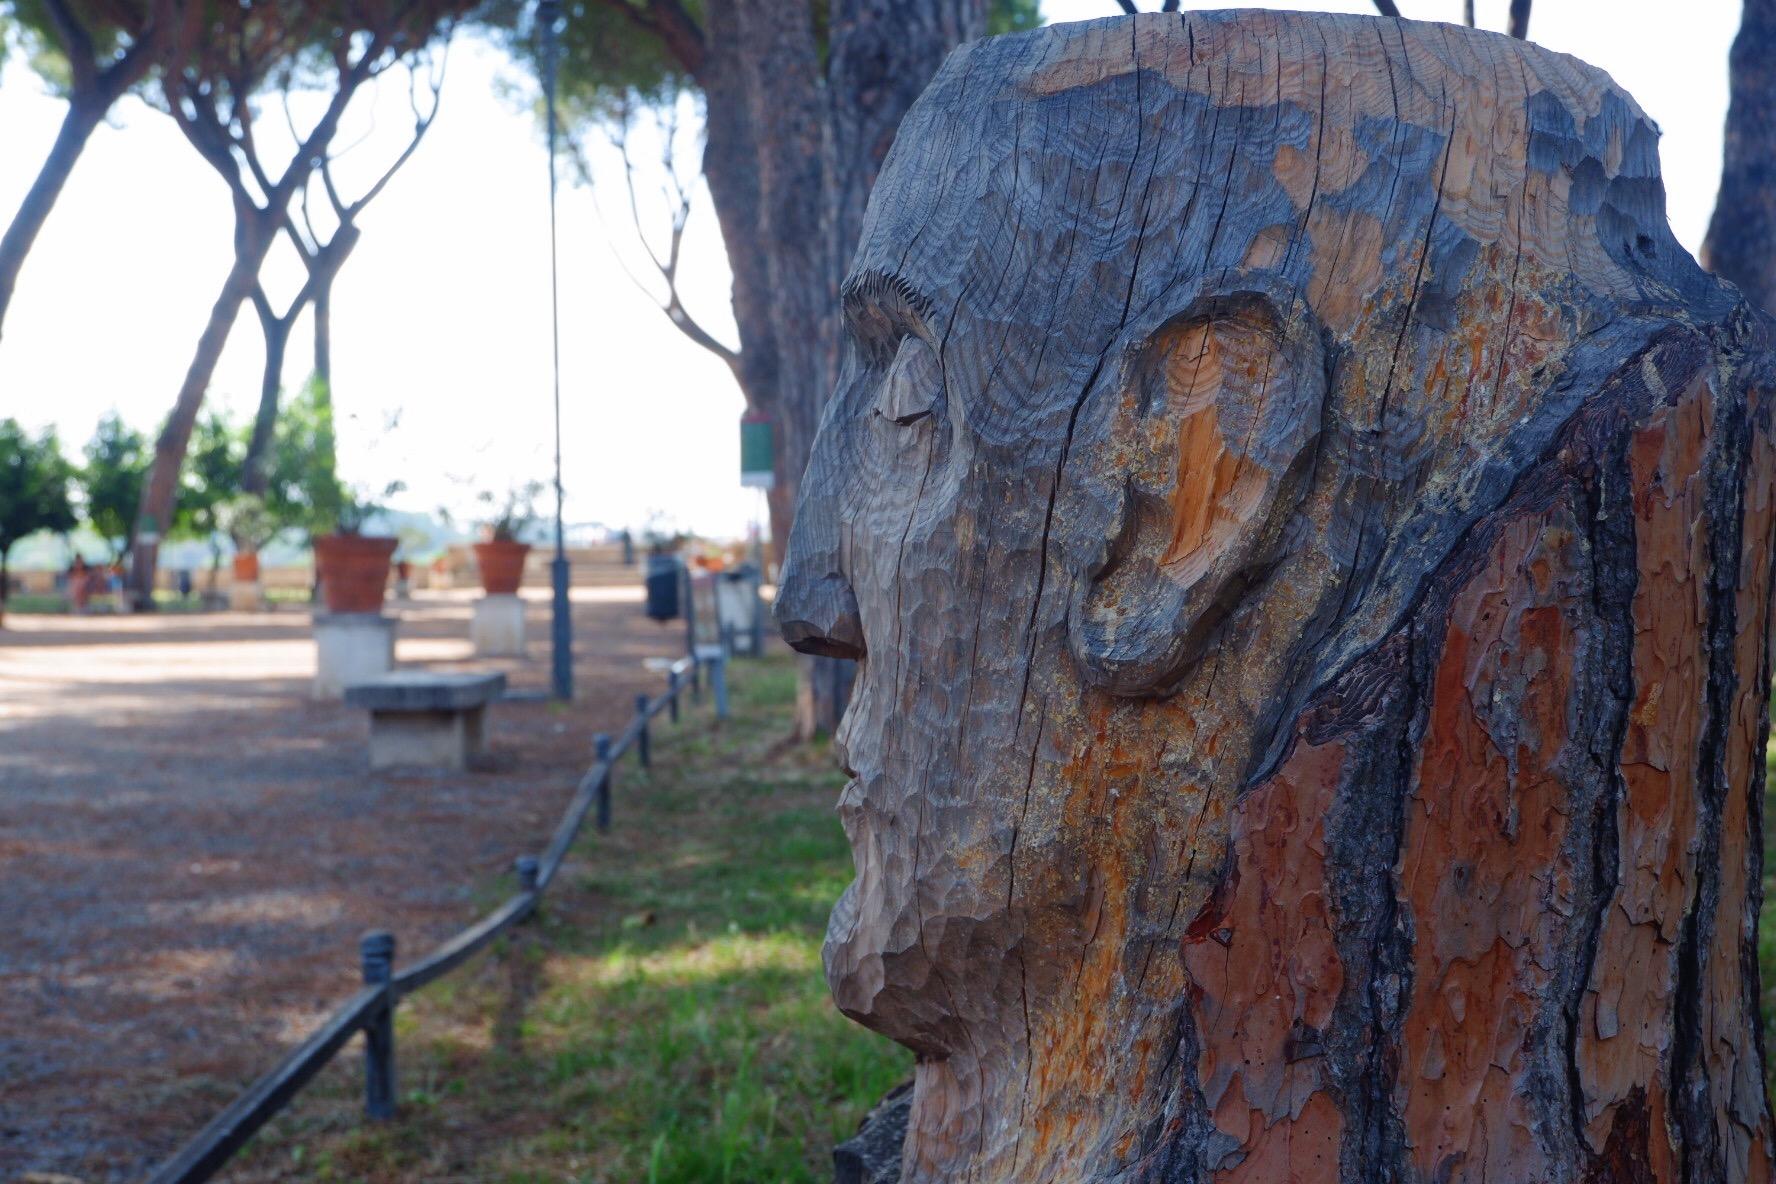 Andrea Gandini sculpture Orange Garden